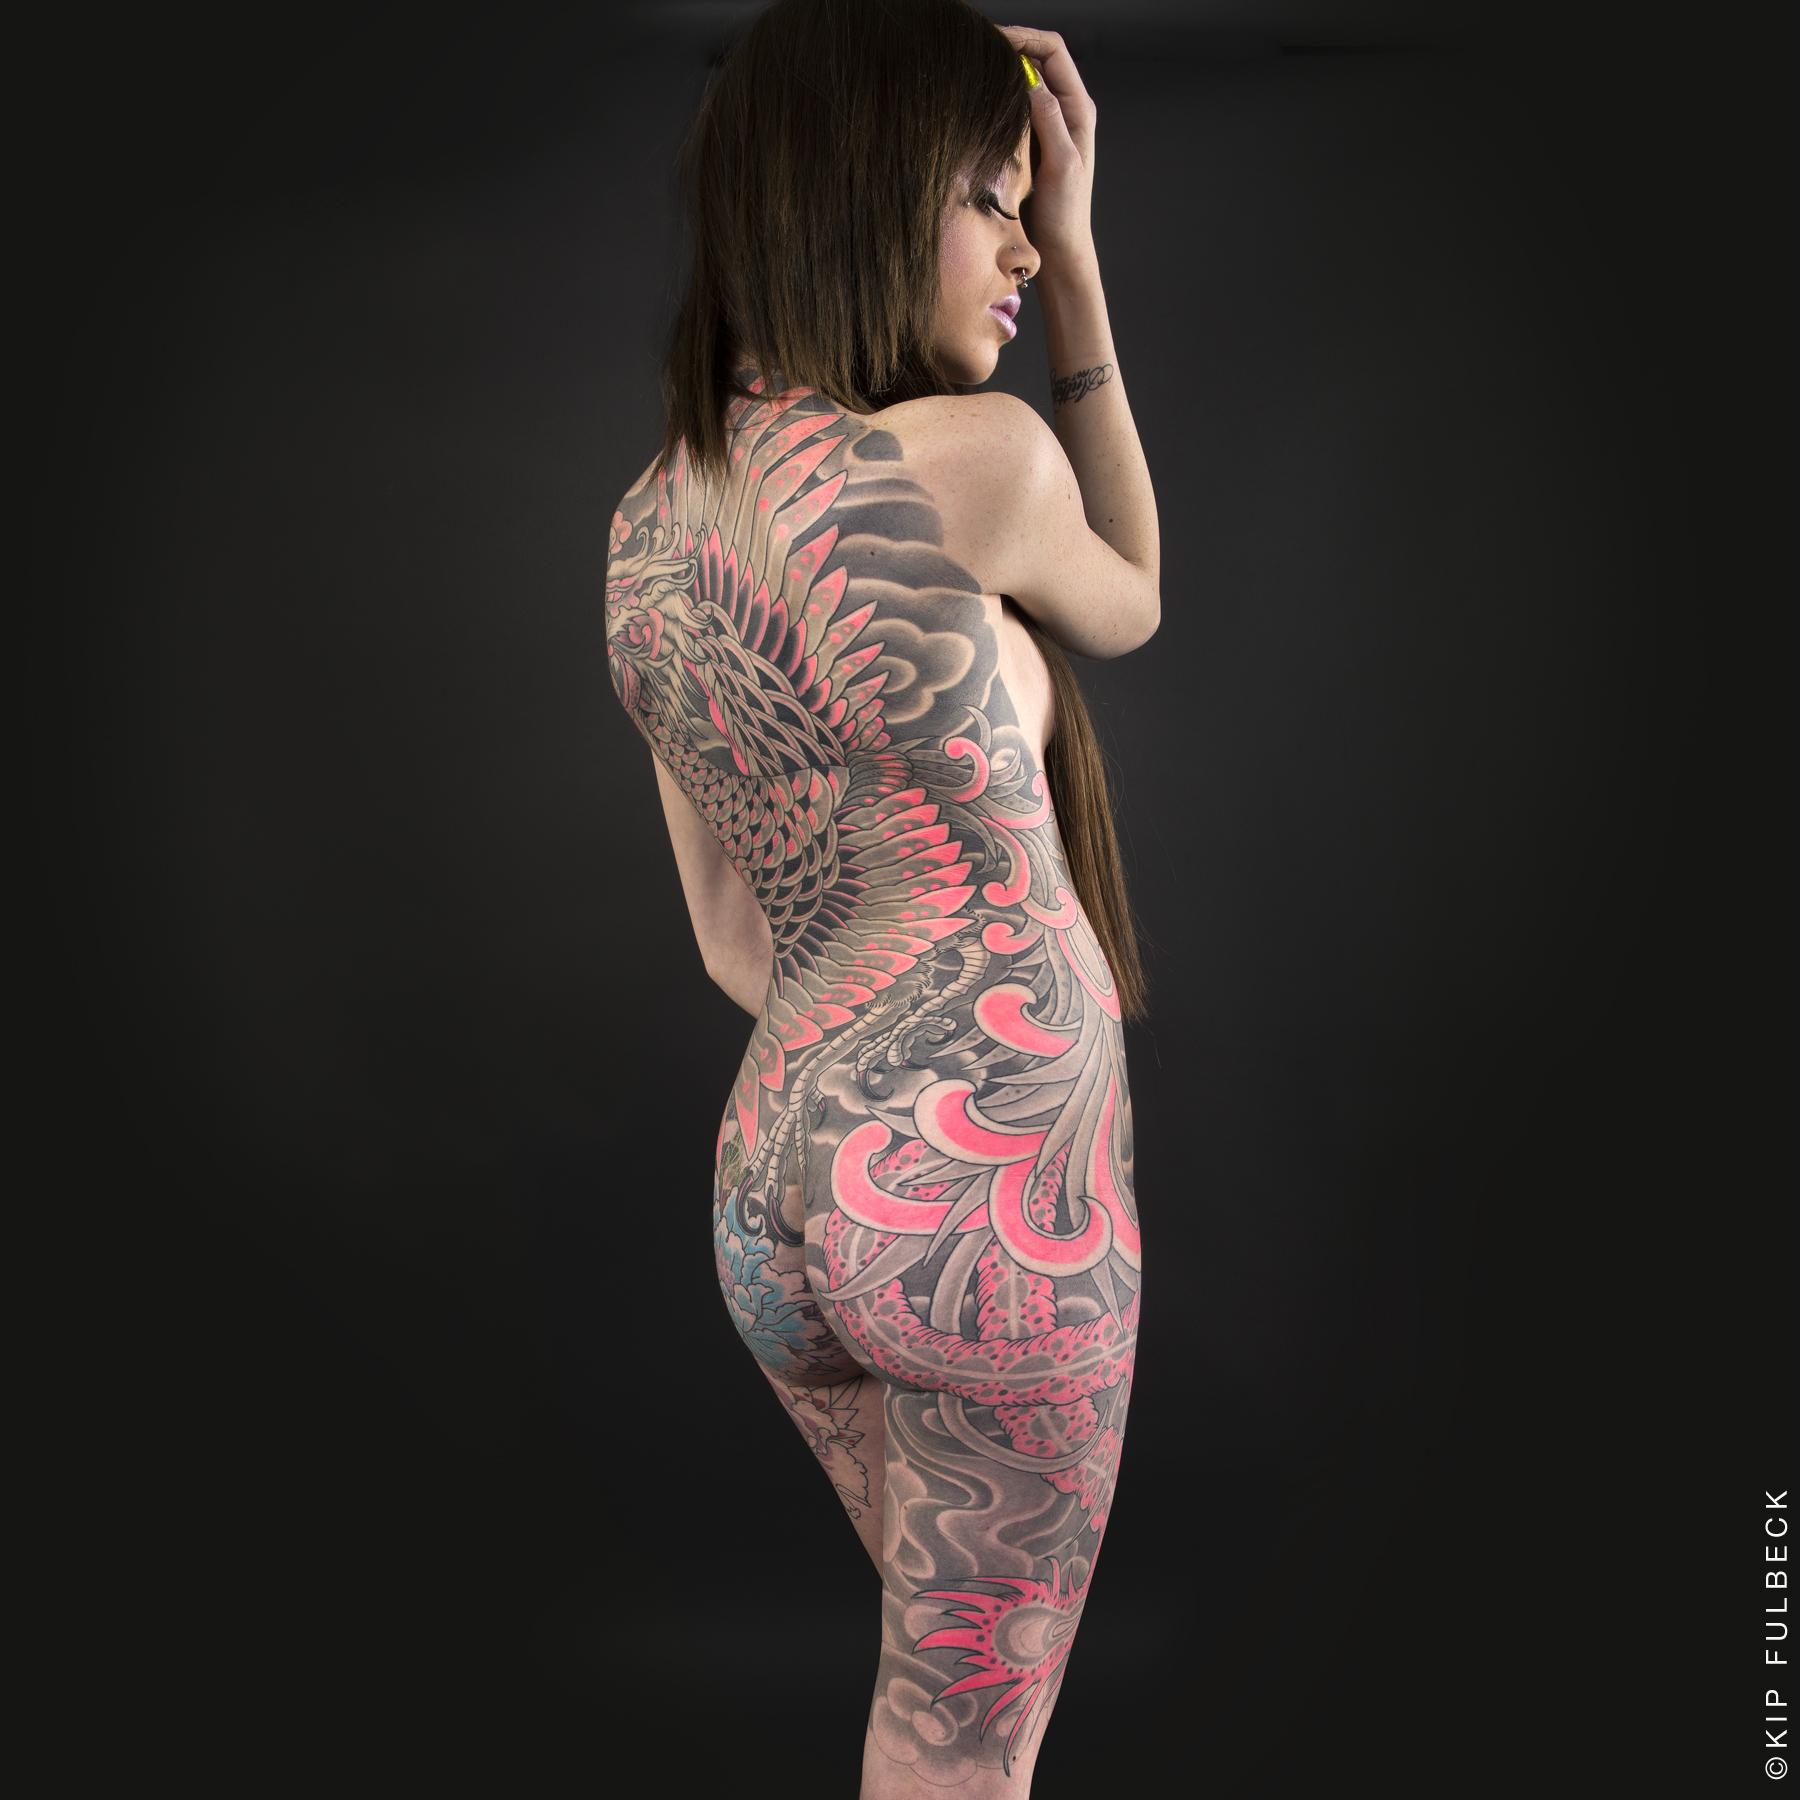 Tattoo by Stan Corona. Photo by Kip Fulbeck